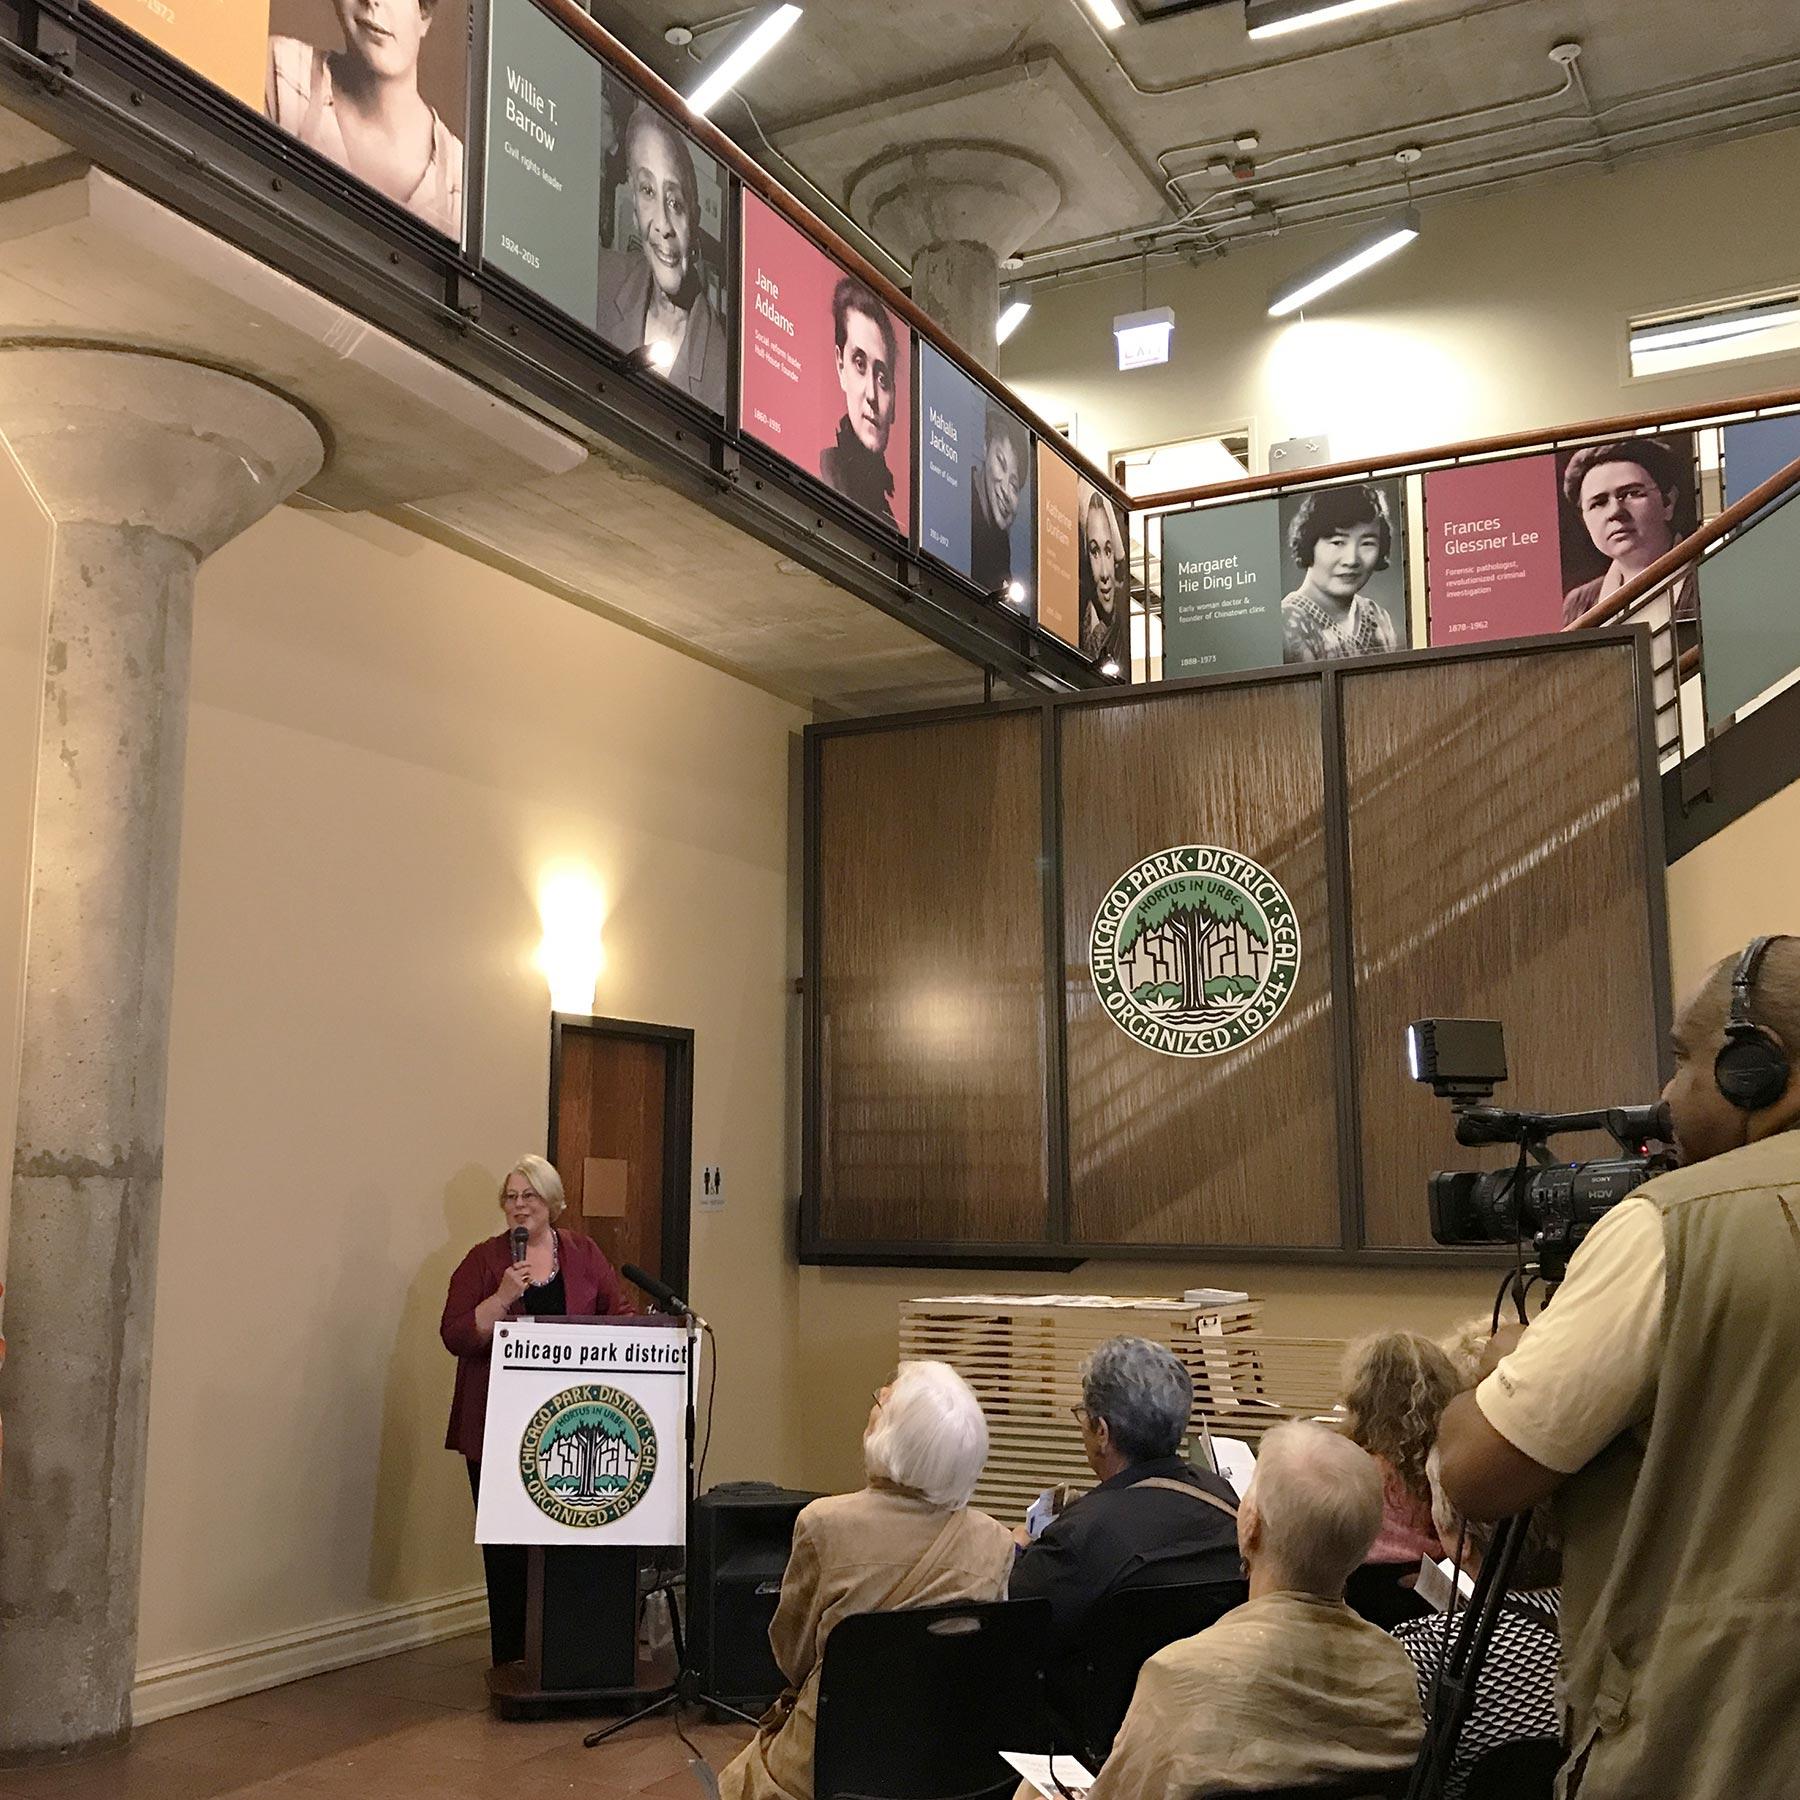 Leslie Recht at Exhibit Dedication in Chicago Women's Park and Gardens, September 14, 2017.